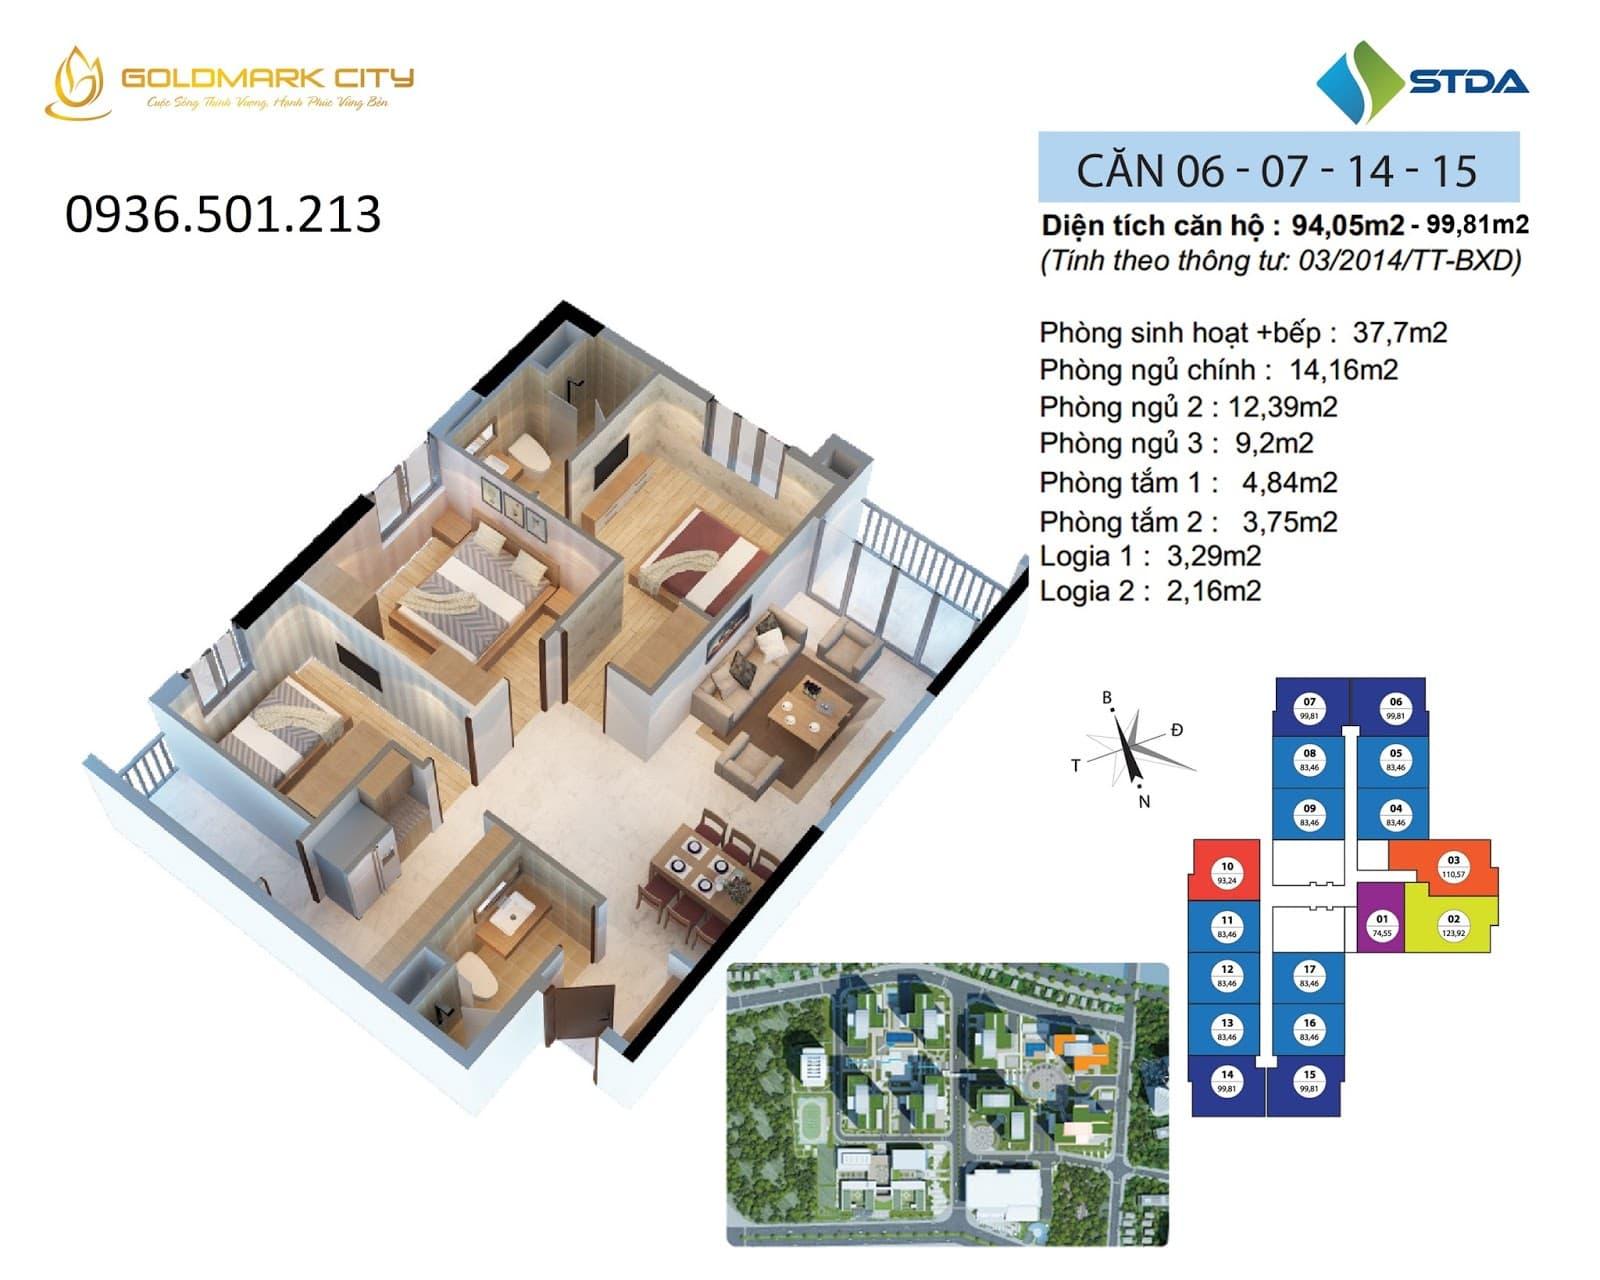 Mặt bằng căn hộ số 06-07-14-15 ruby 2- Goldmark City 136 Hồ Tùng Mậu